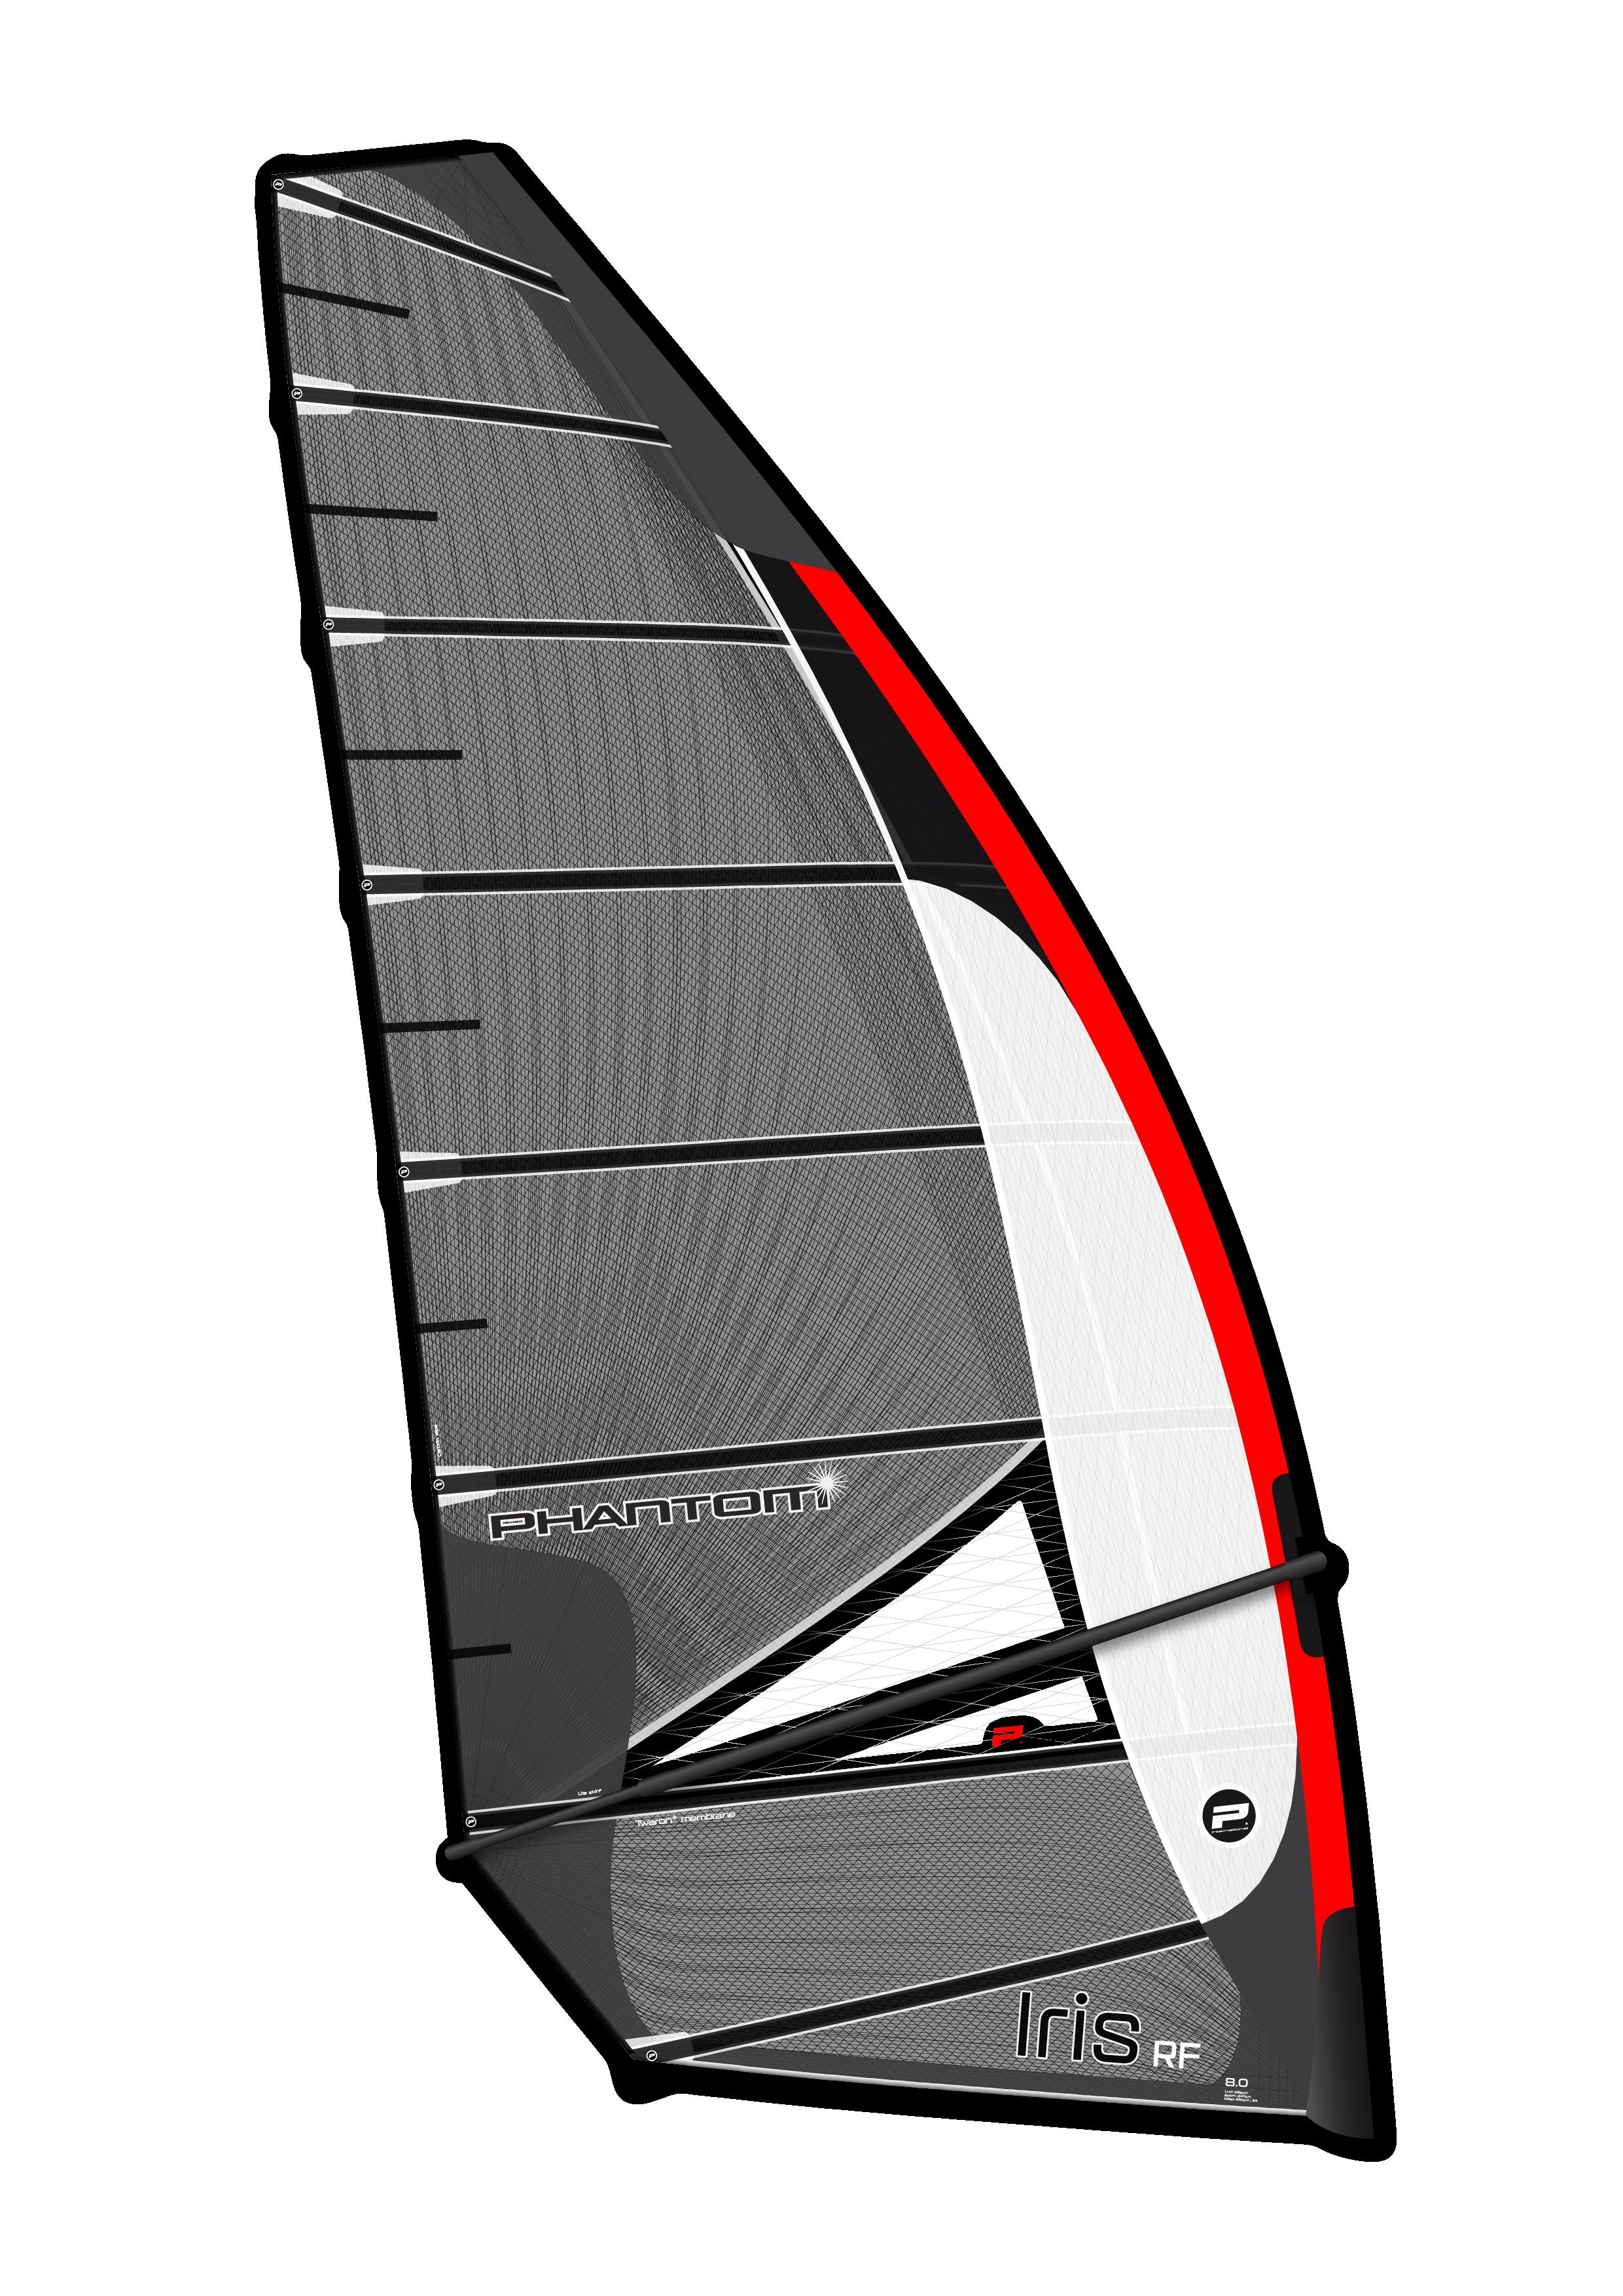 IRIS RF 8.0